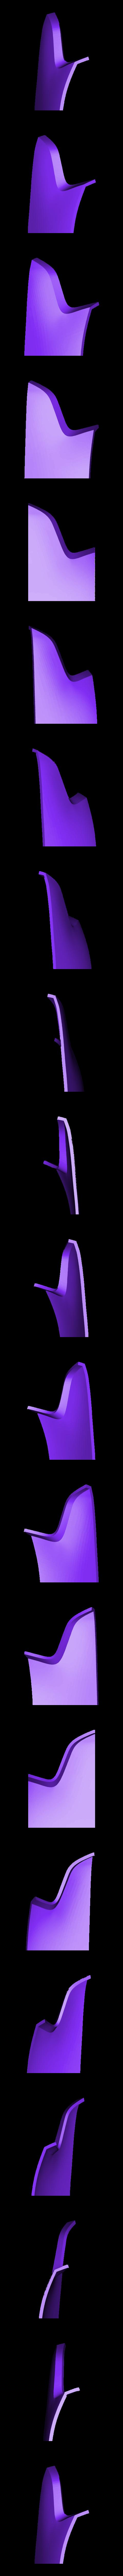 Part_7_v3.stl Download free STL file Blood Dragon Helmet Mass Effect 2 • Design to 3D print, VillainousPropShop